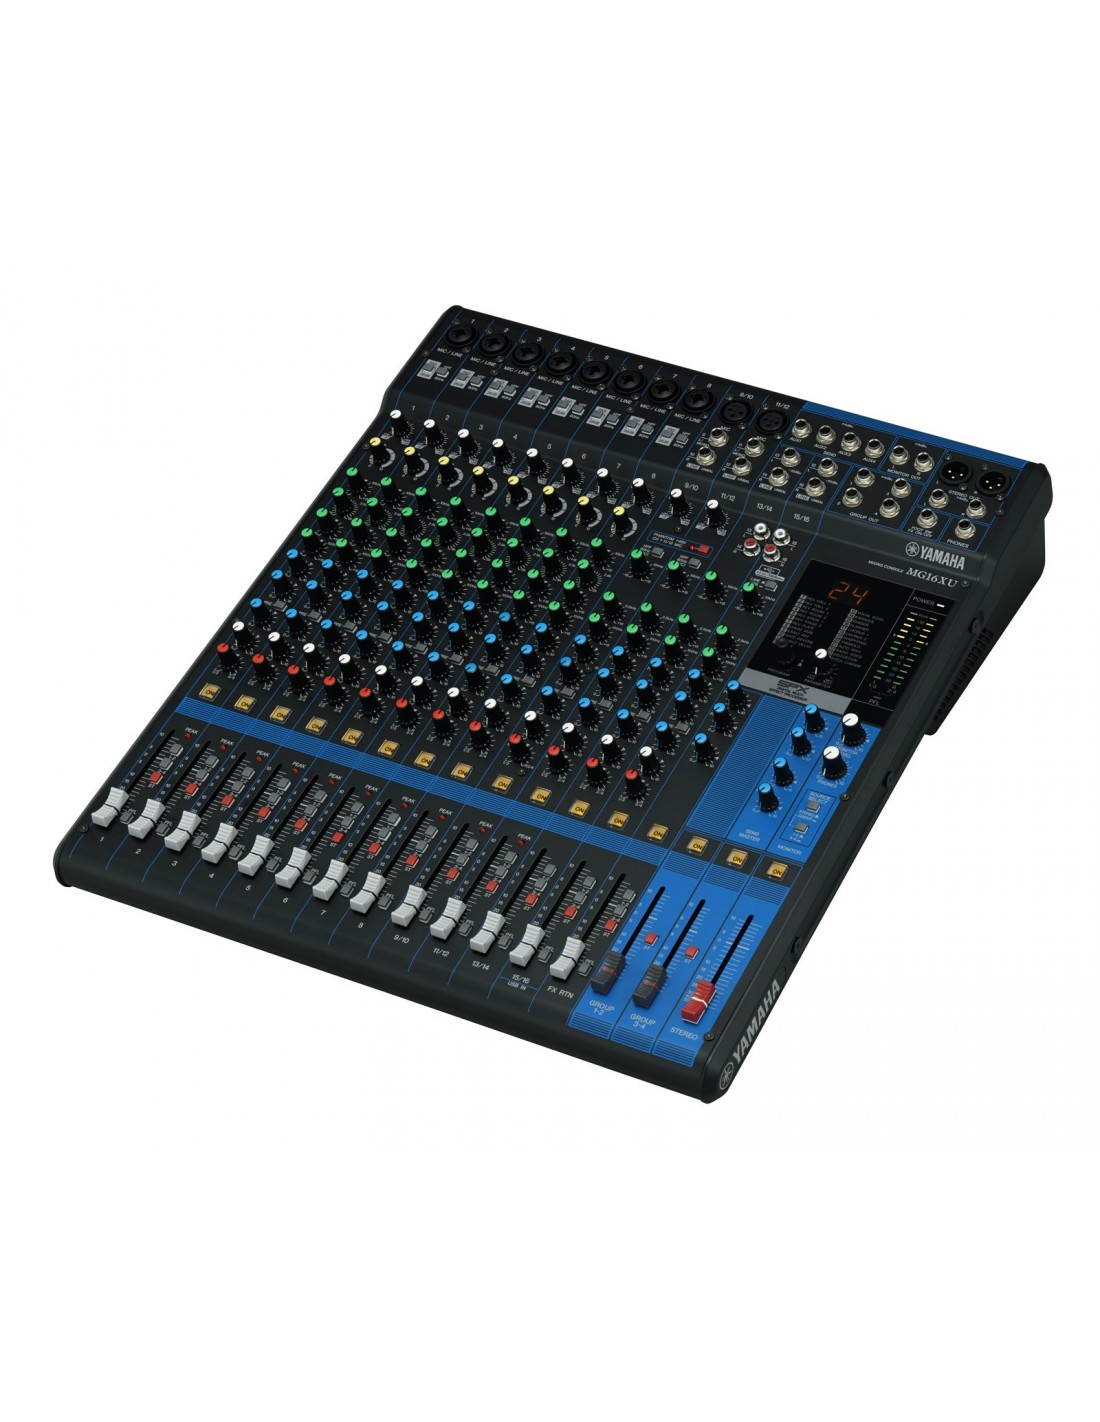 Yamaha MG16xu Table De Mixage Au Meilleur Prix Sunmusicfr